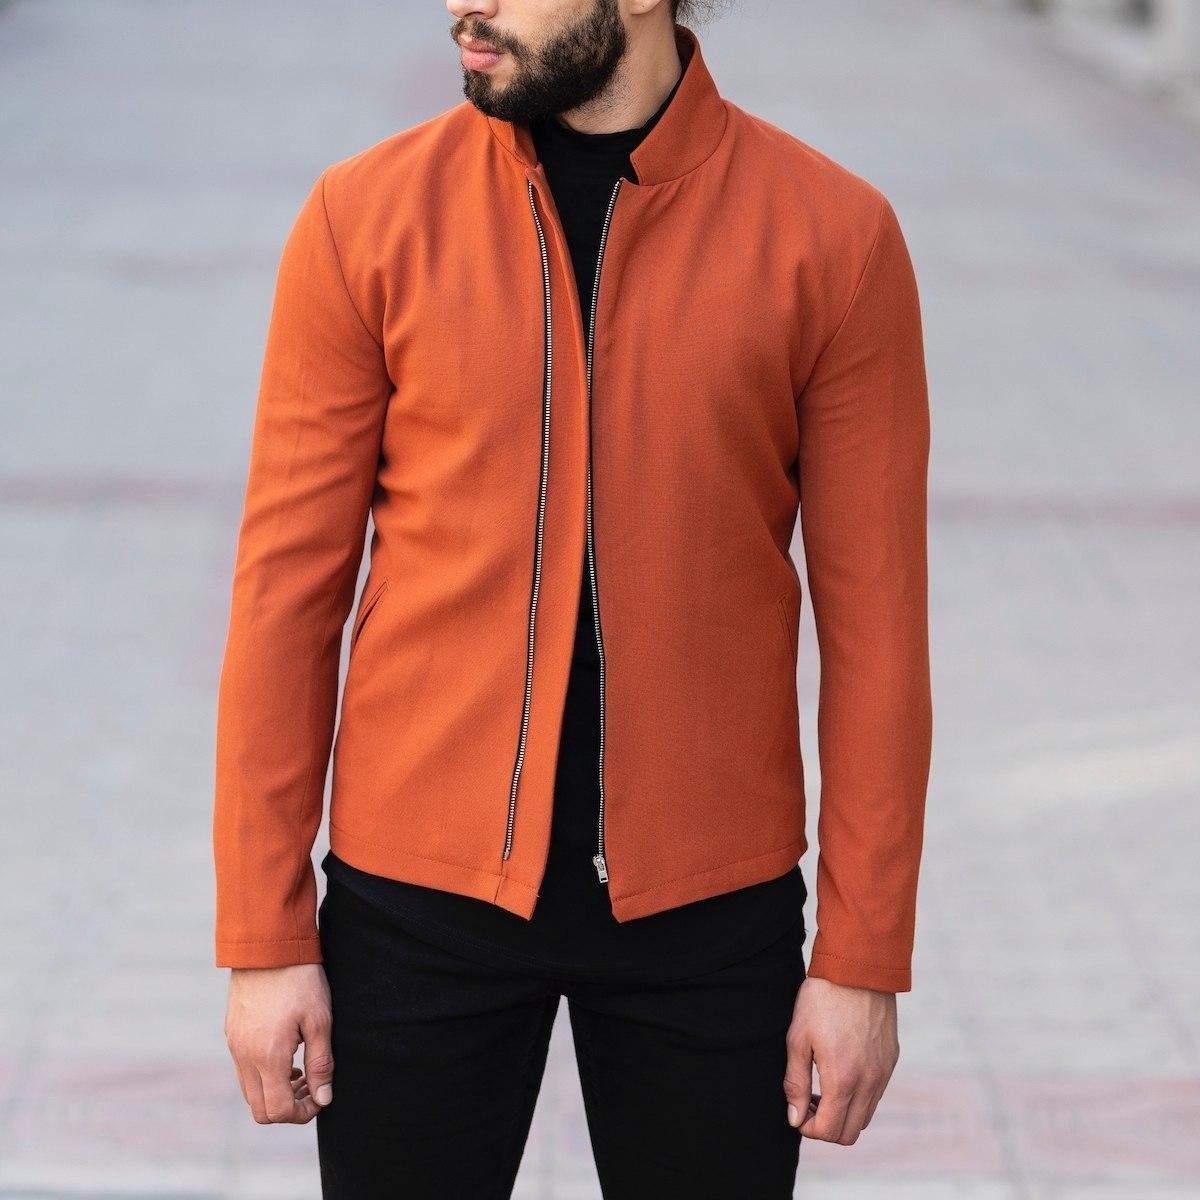 Orange Autumn Collection...